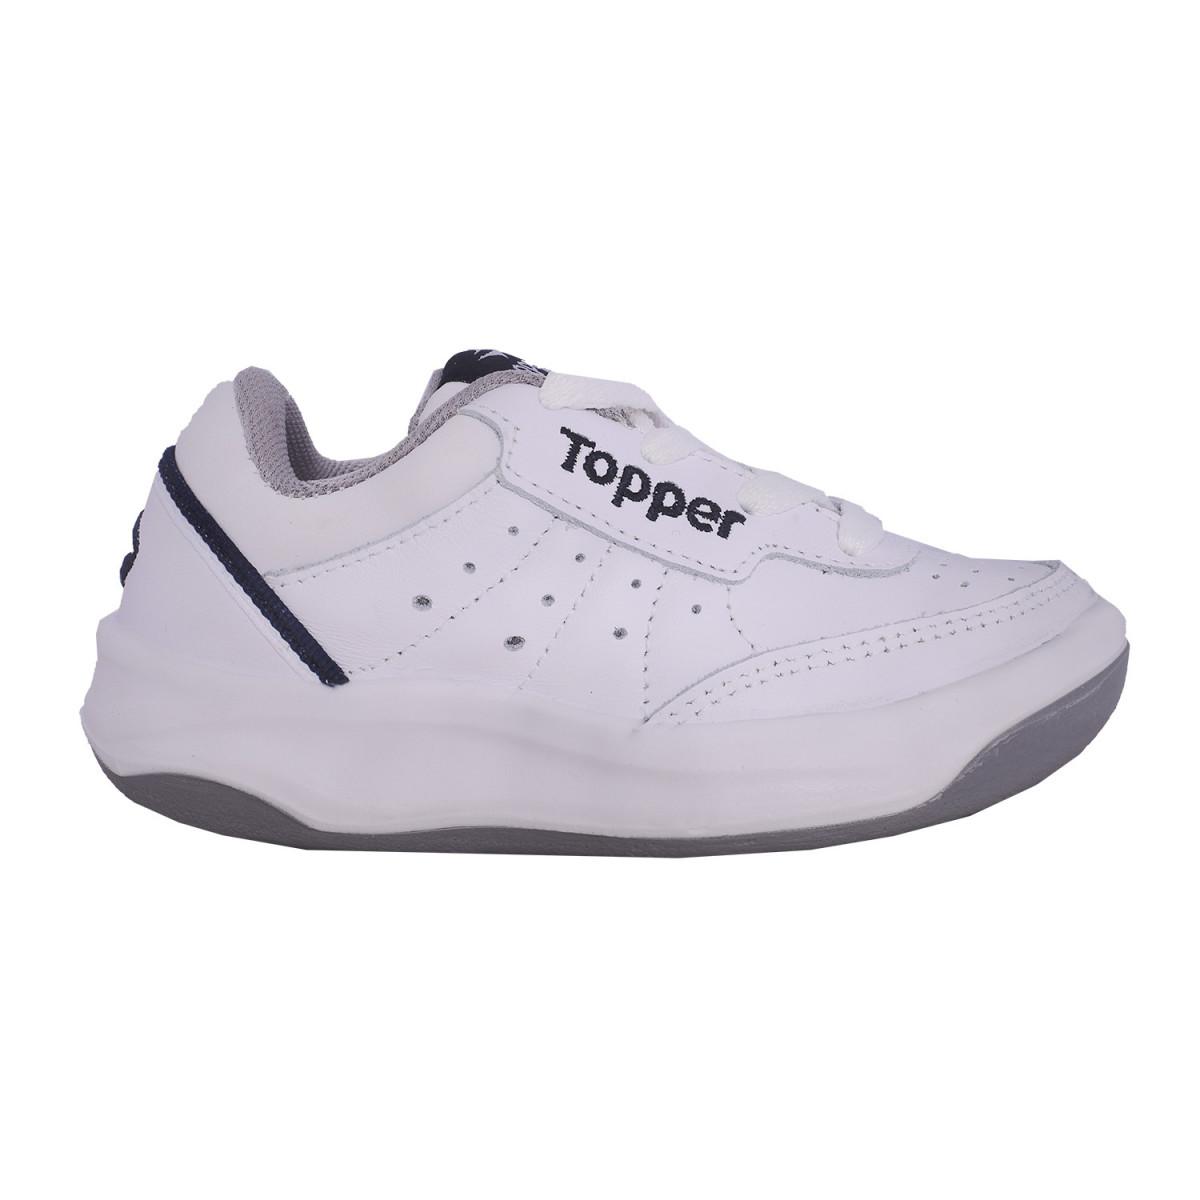 Zapatillas Topper X Forcer Kids (Cf)